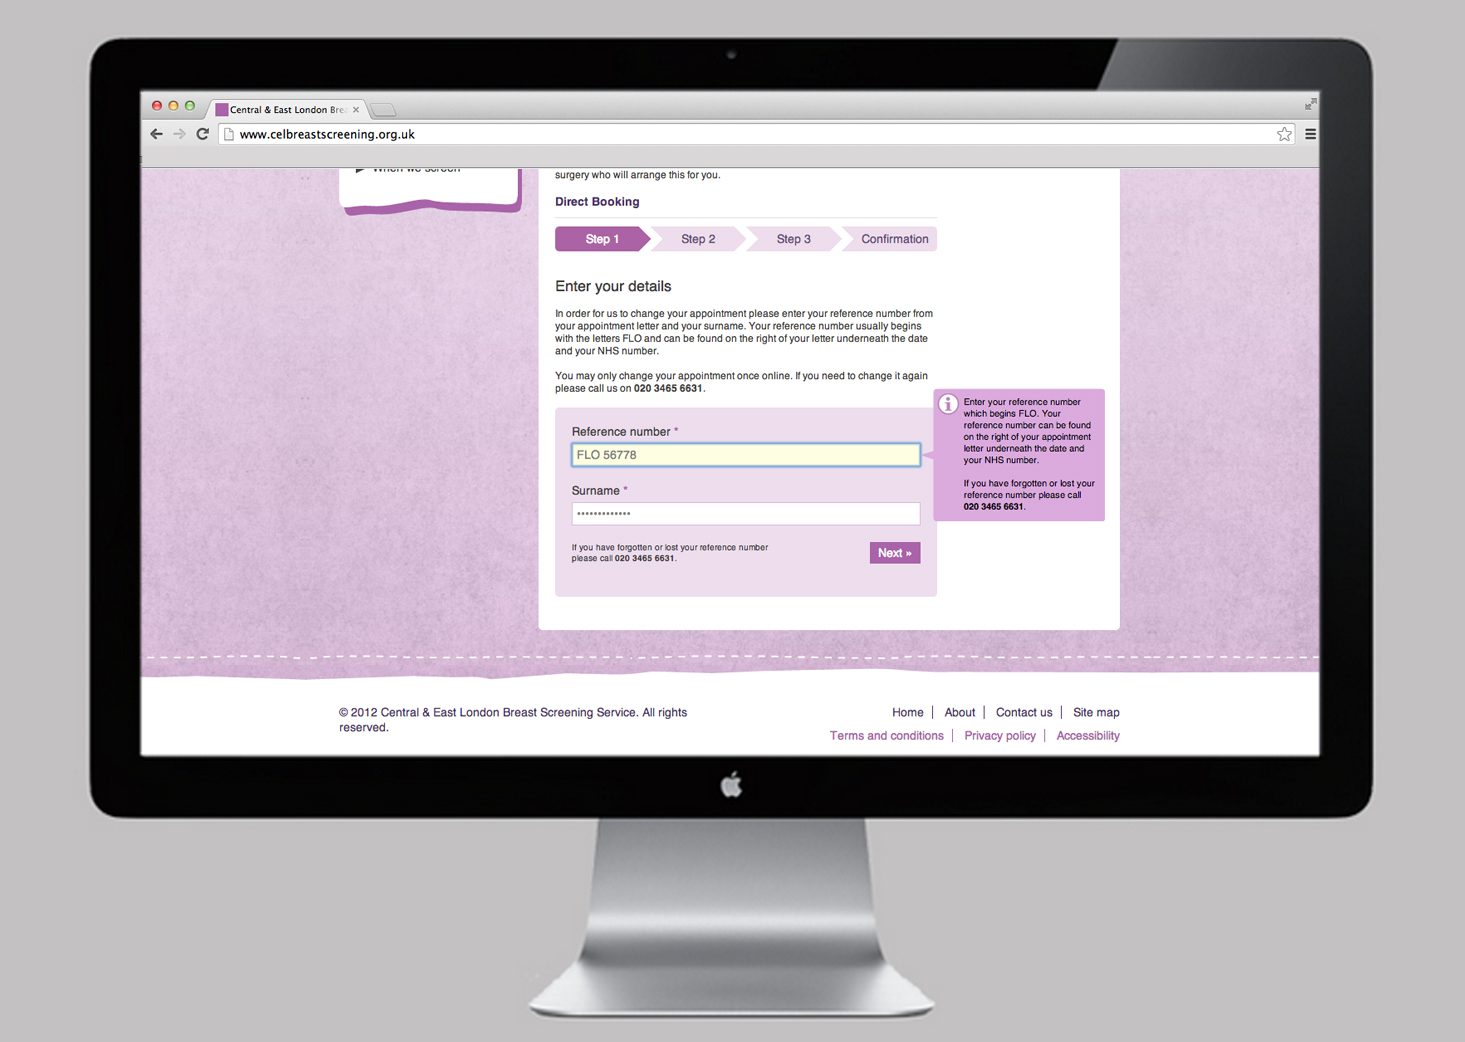 NHS Breast Screening website direct booking